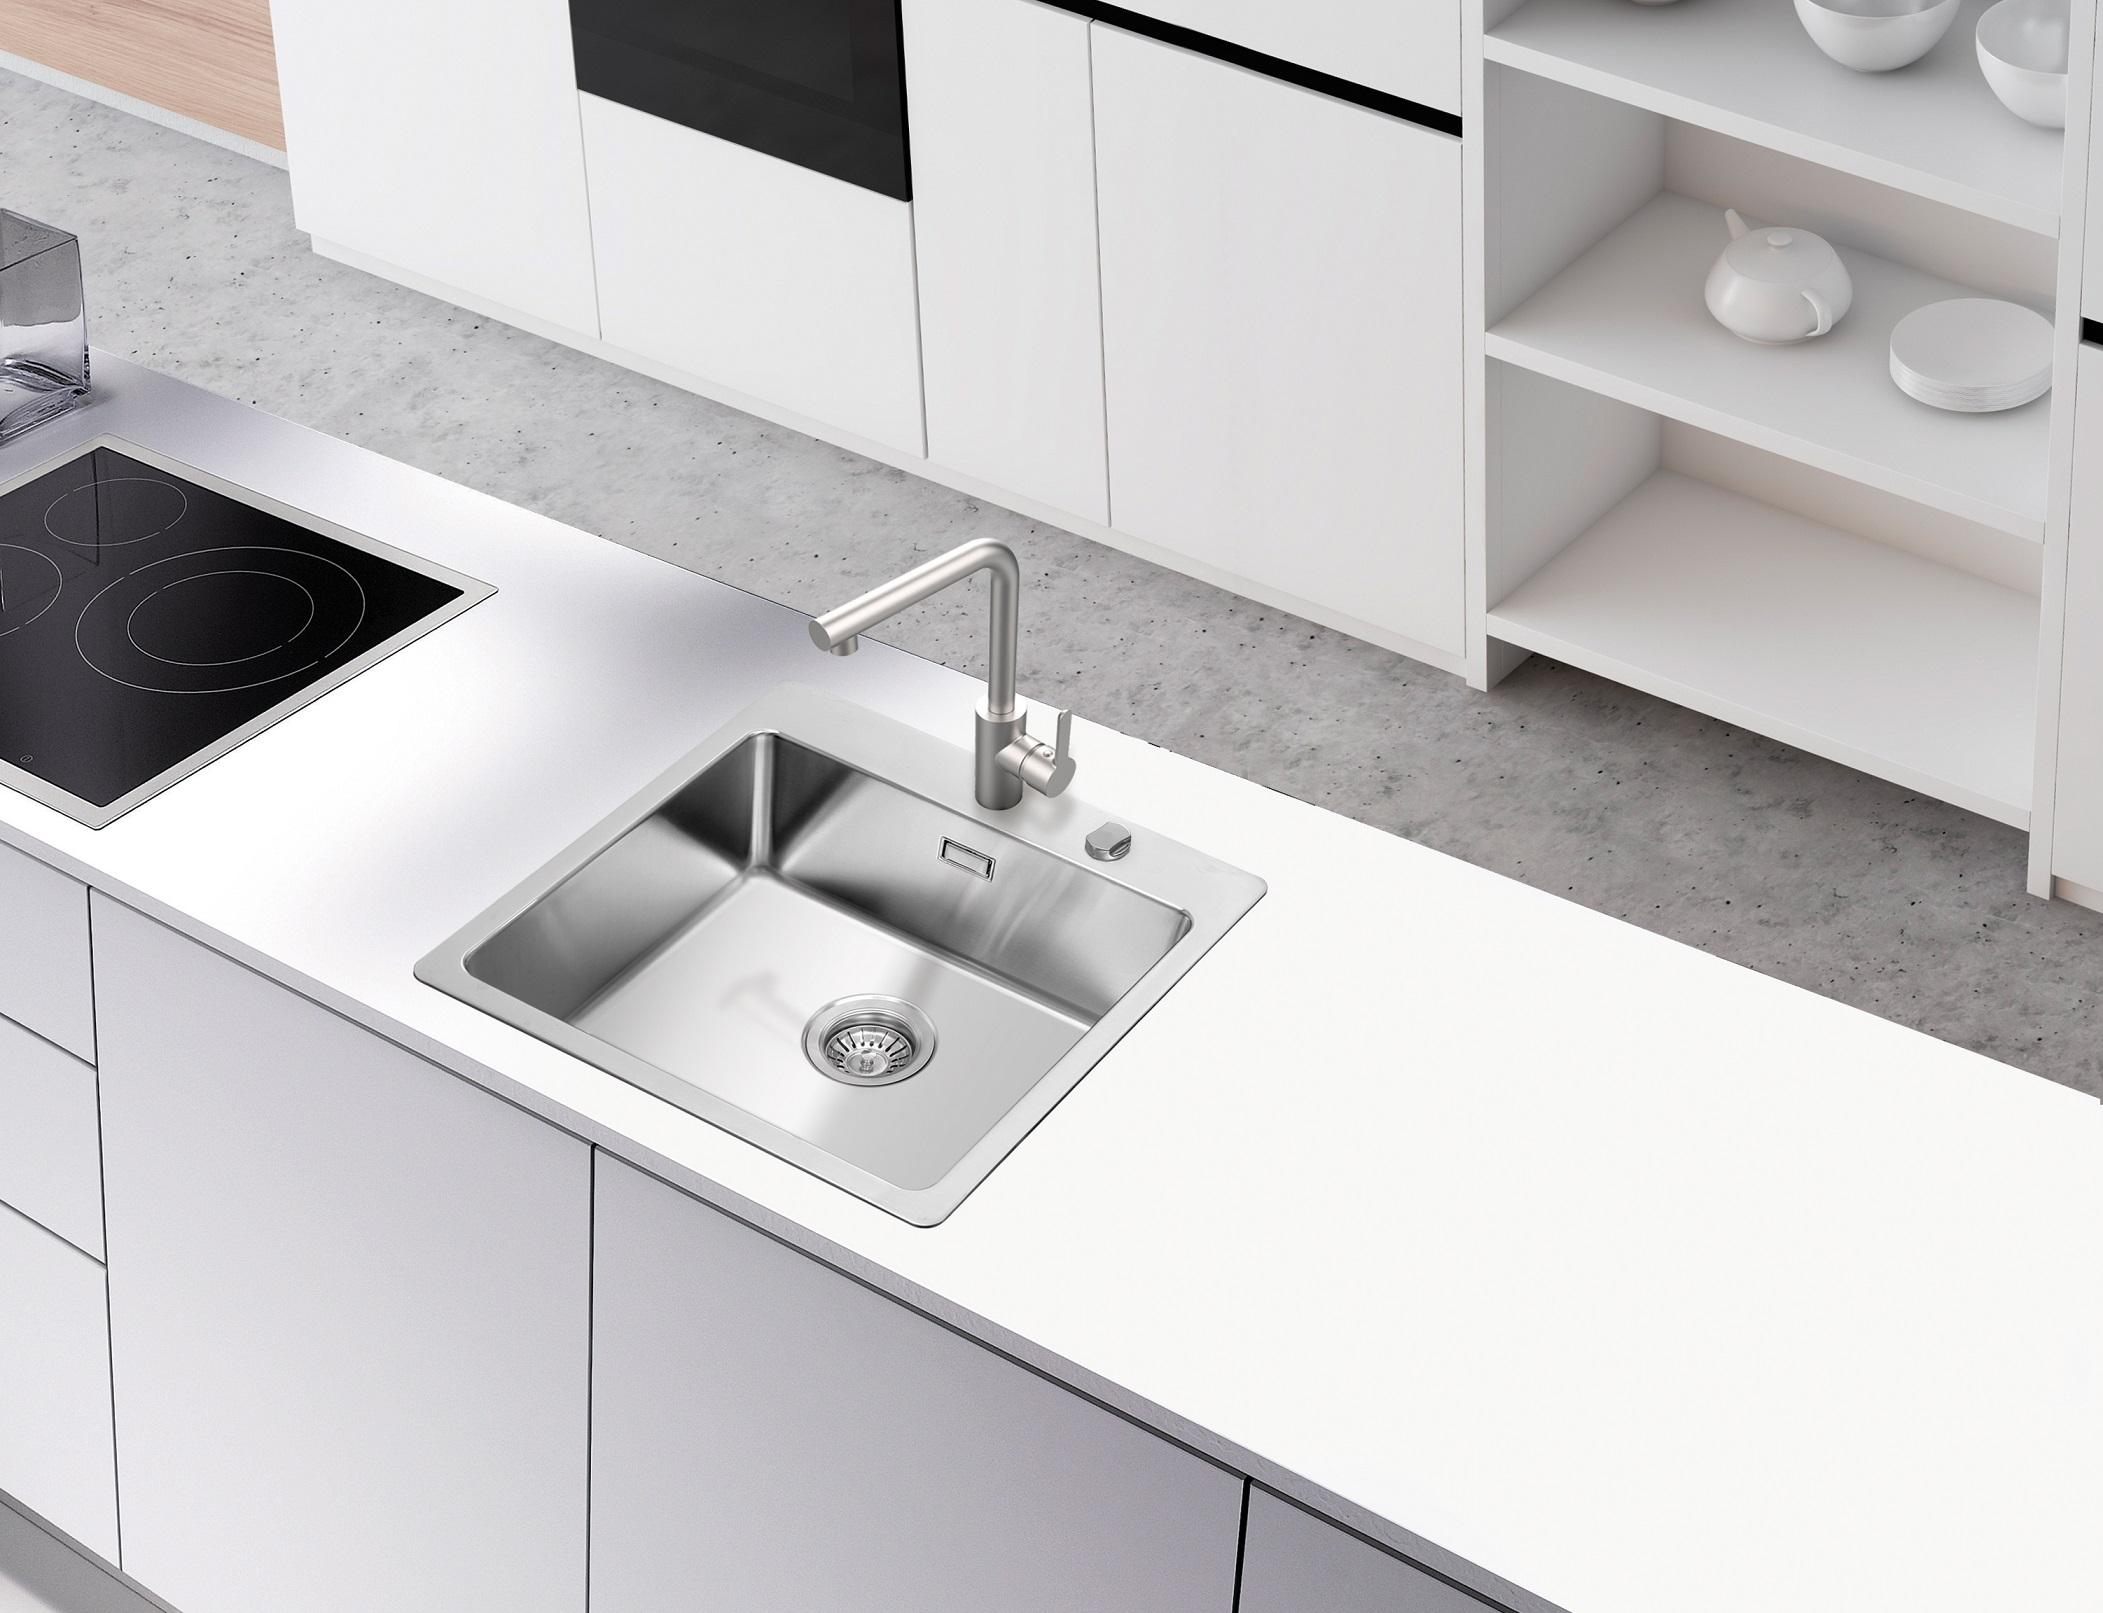 respekta Spüle Edelstahlspüle Einbauspüle Küchenspüle Spülbecken Edelstahl 50x50